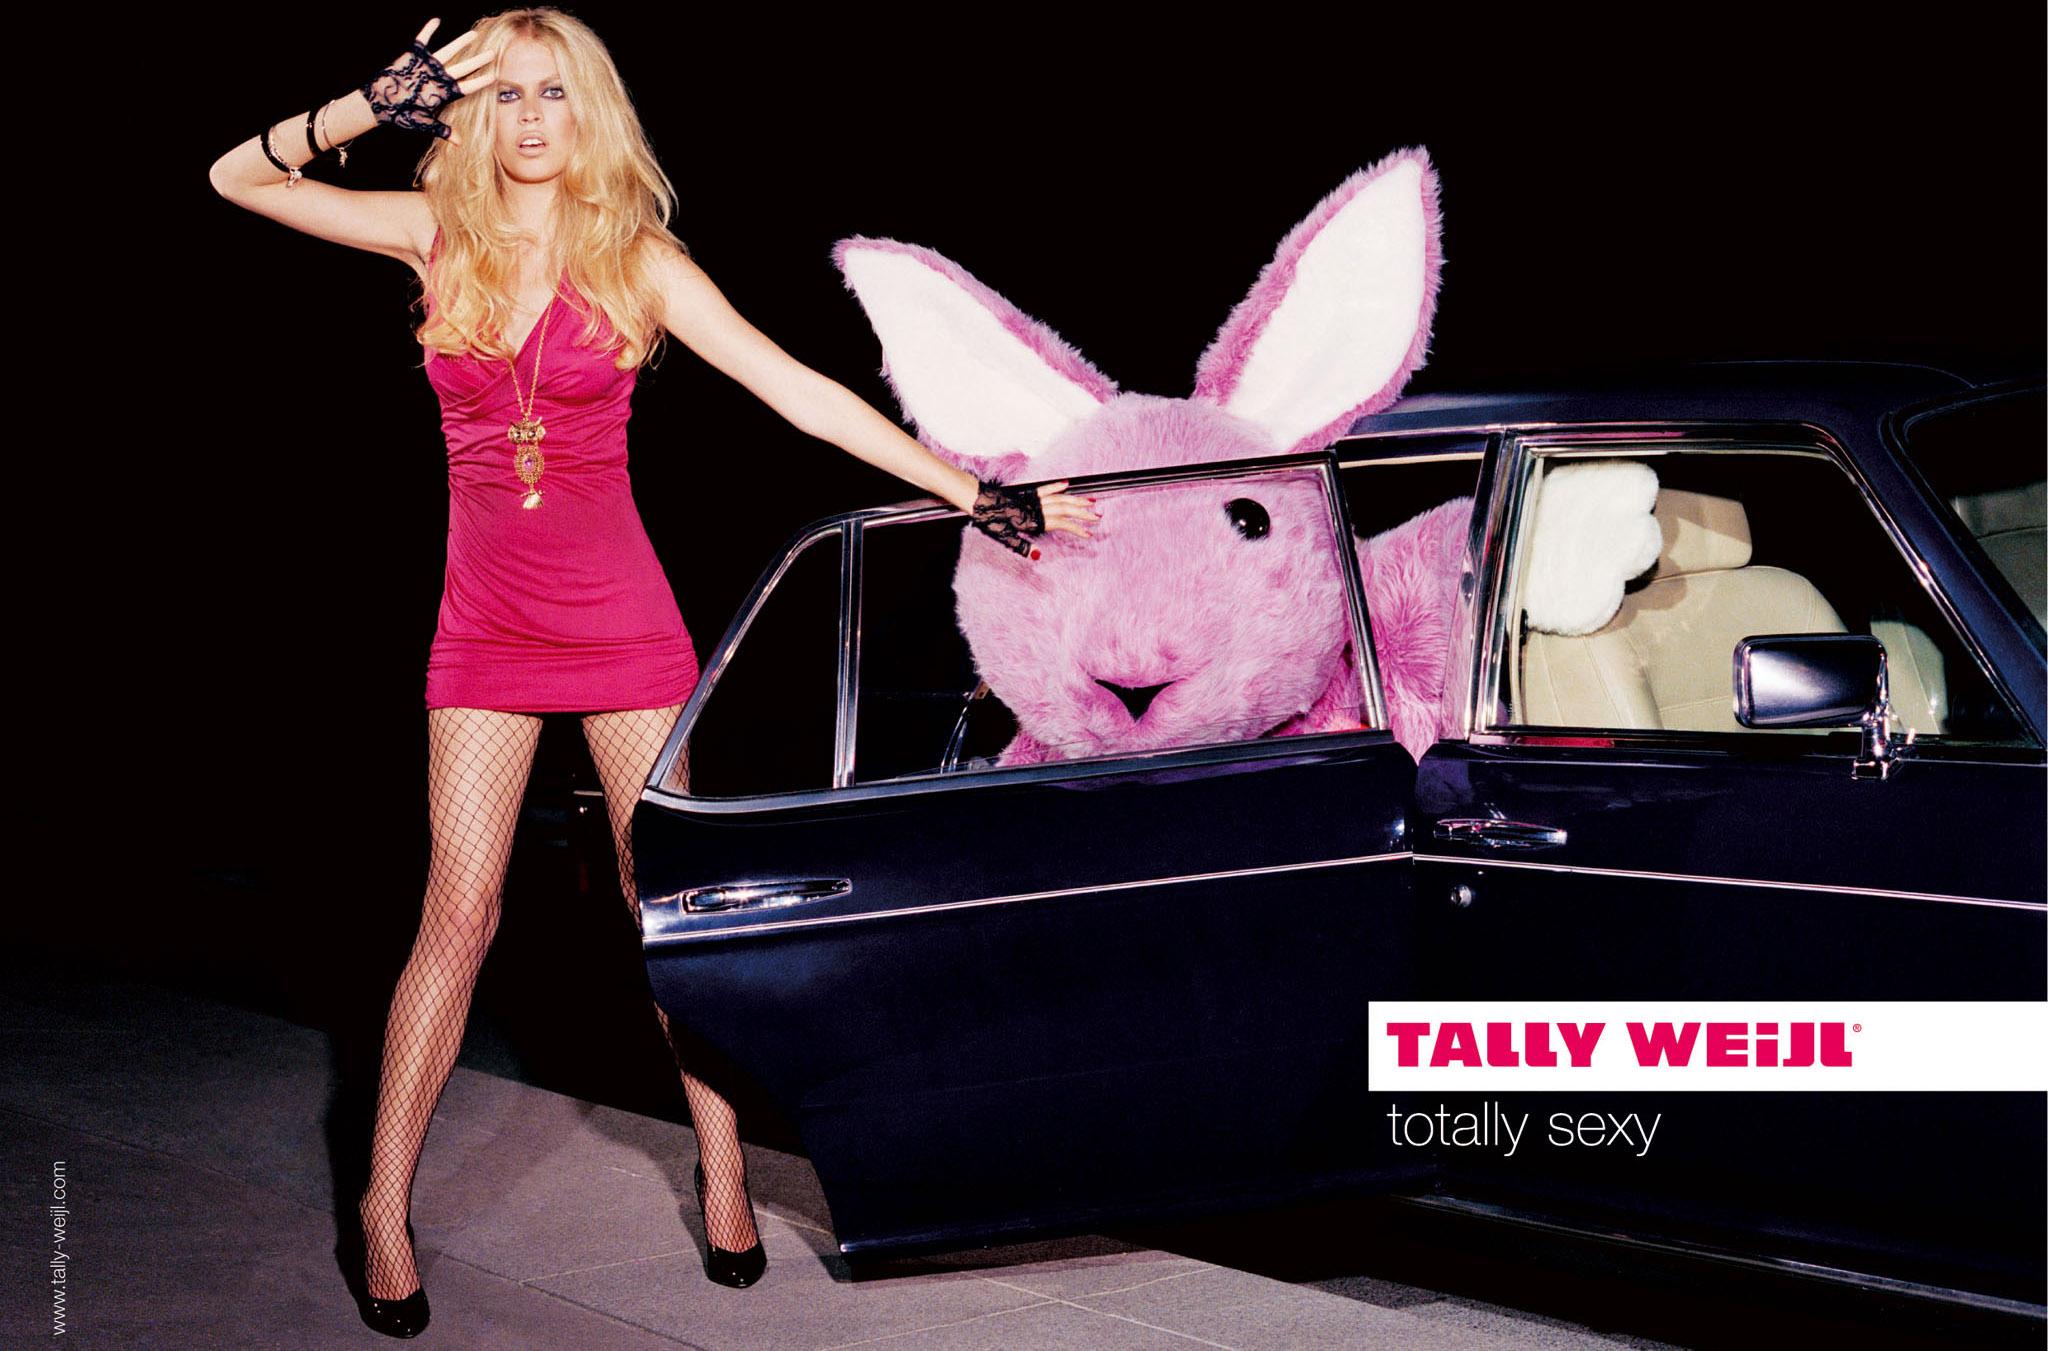 Totally Tally - TALLY WEiJL